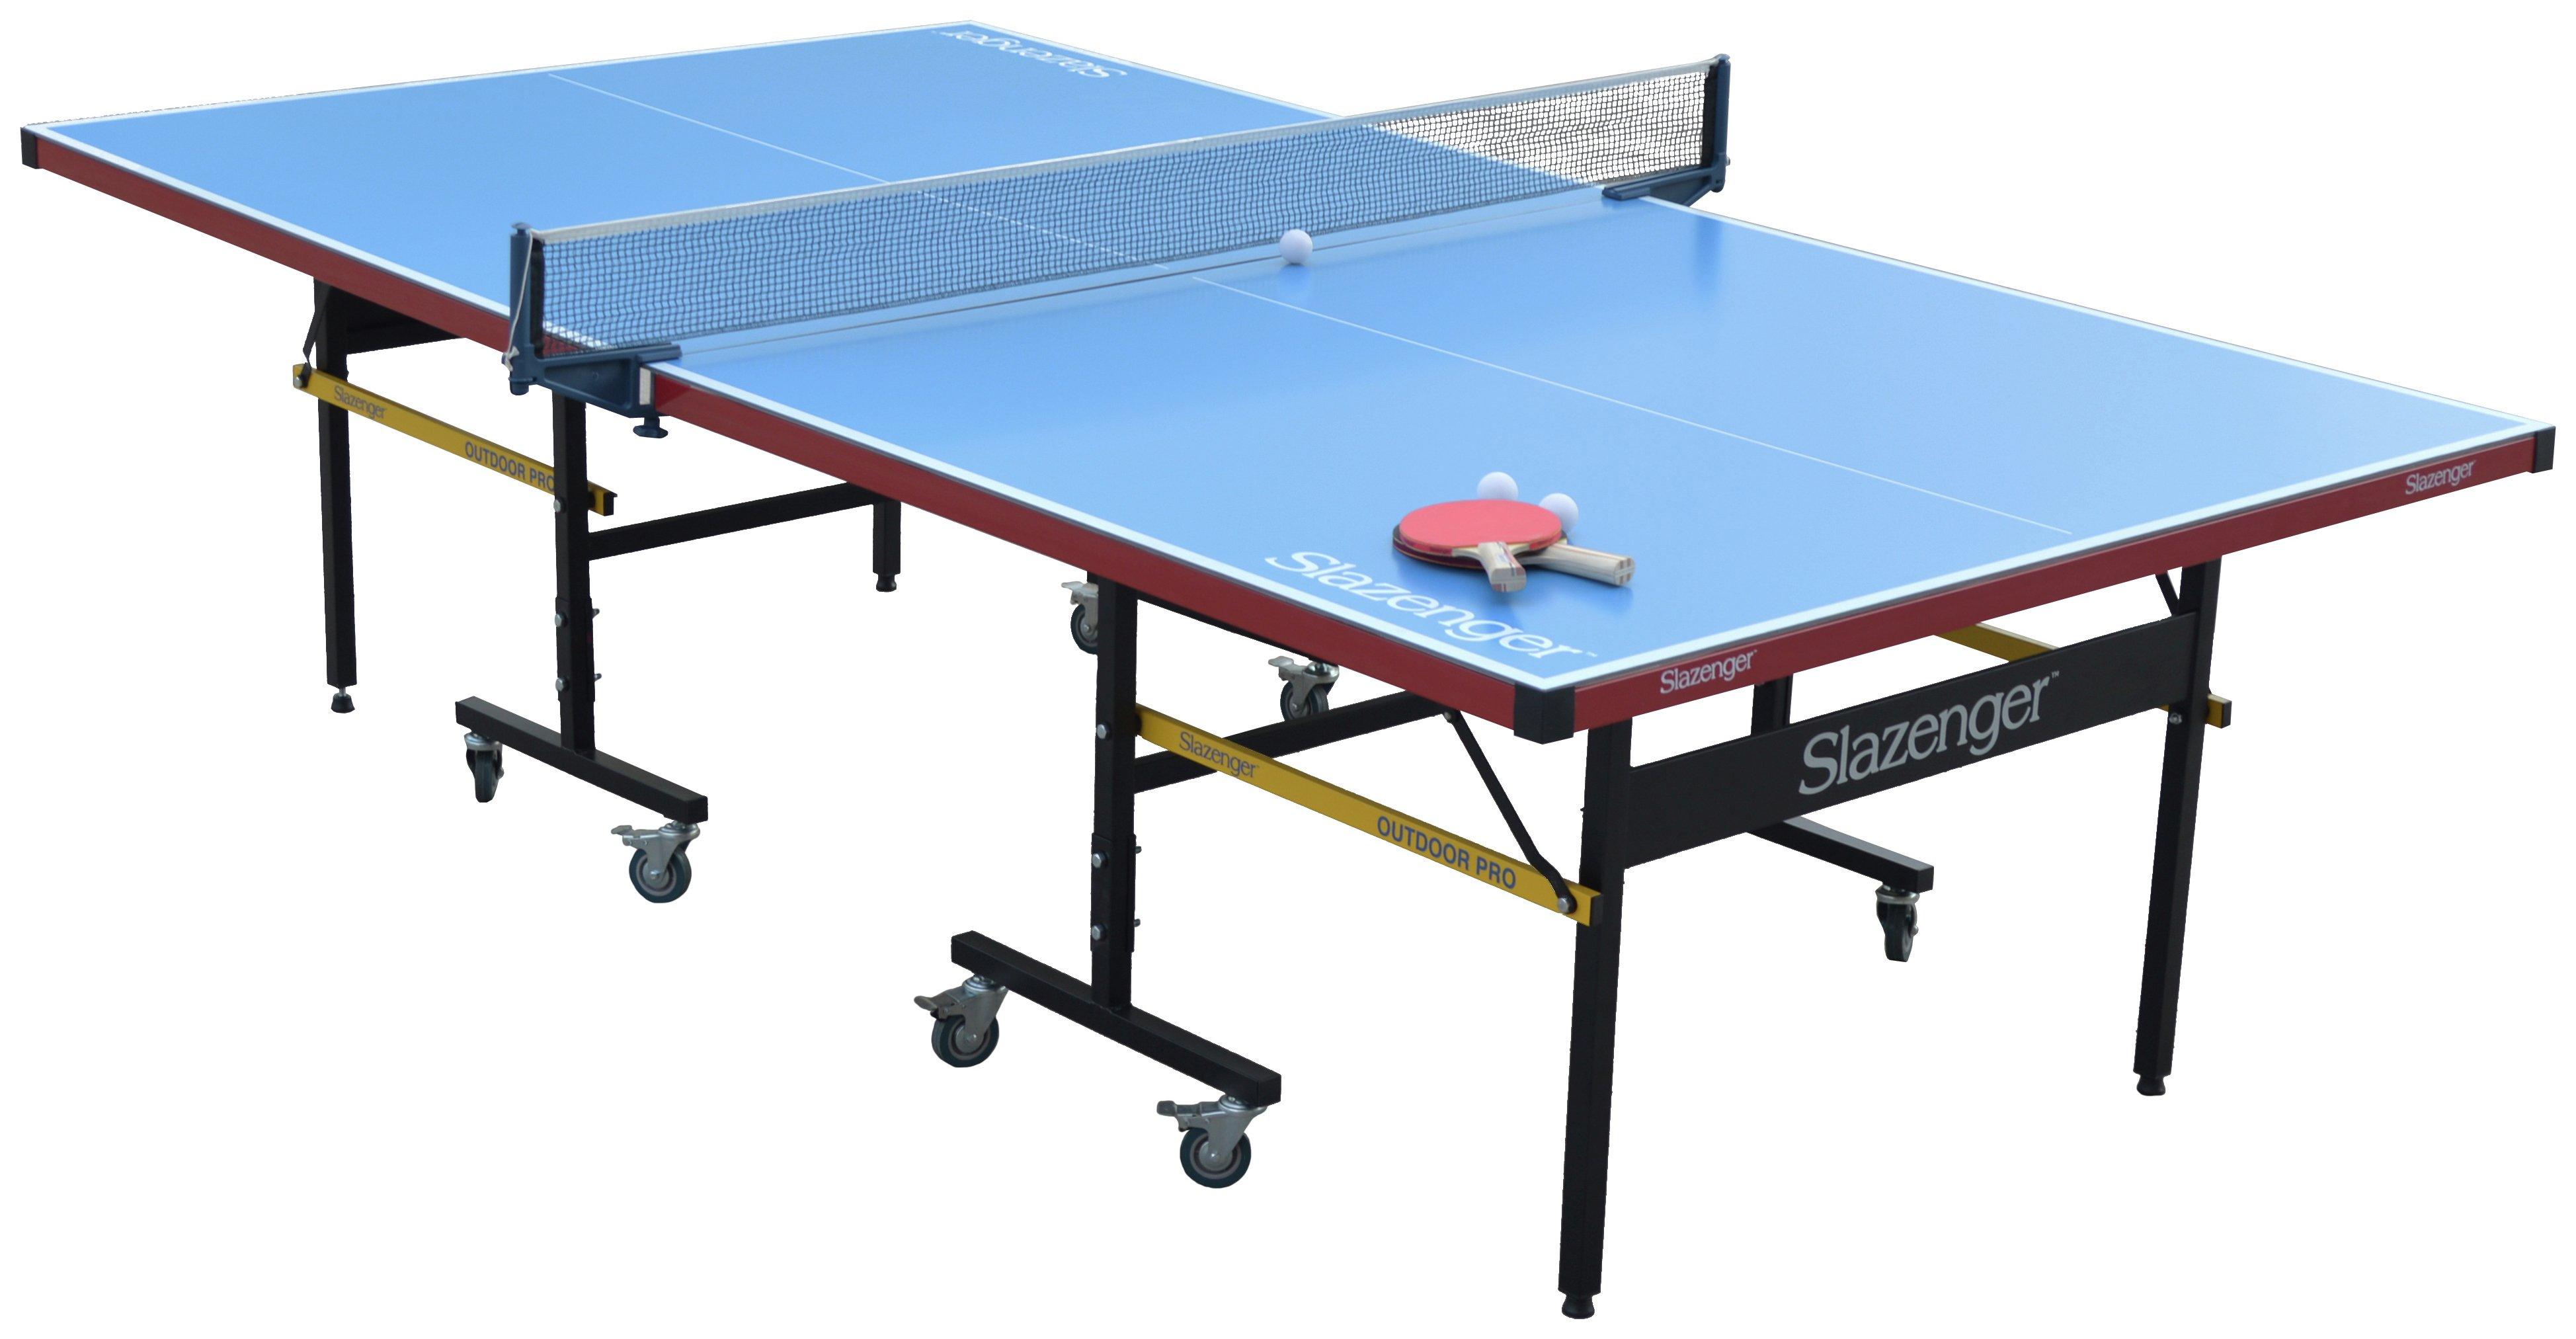 Image of Slazenger - Full Size Outdoor Table Tennis Table